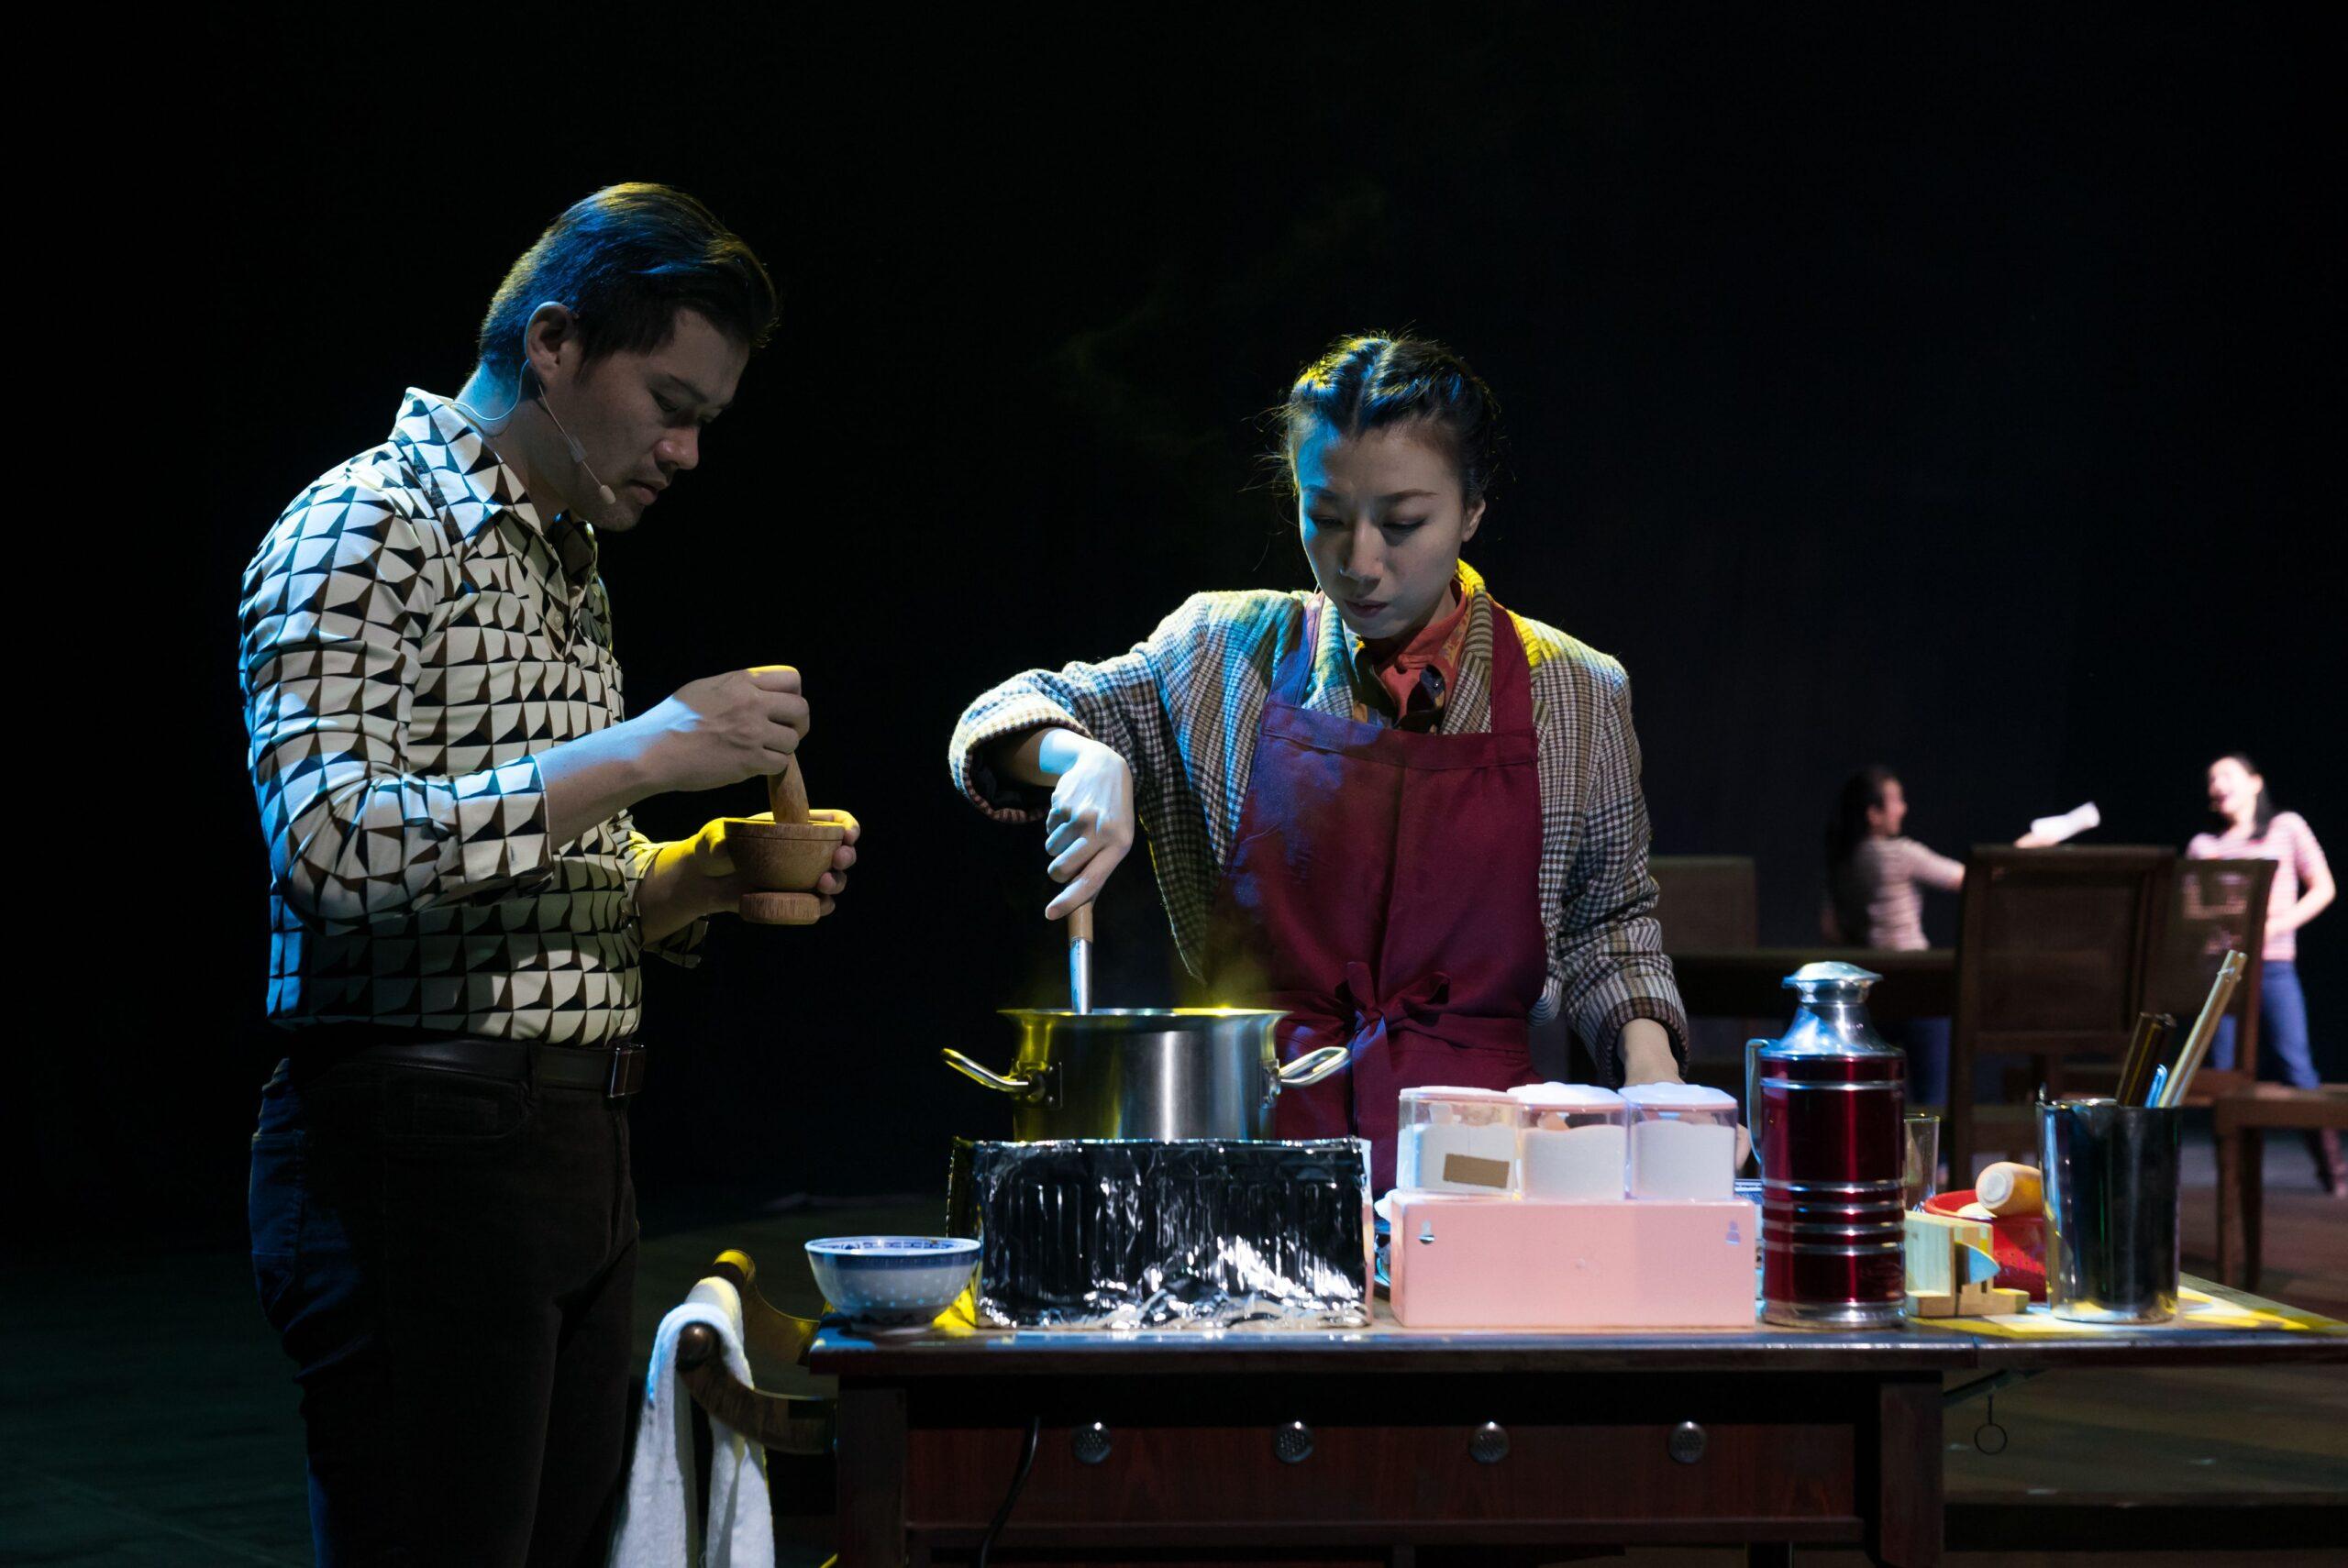 Sweet Mandarin stage performance